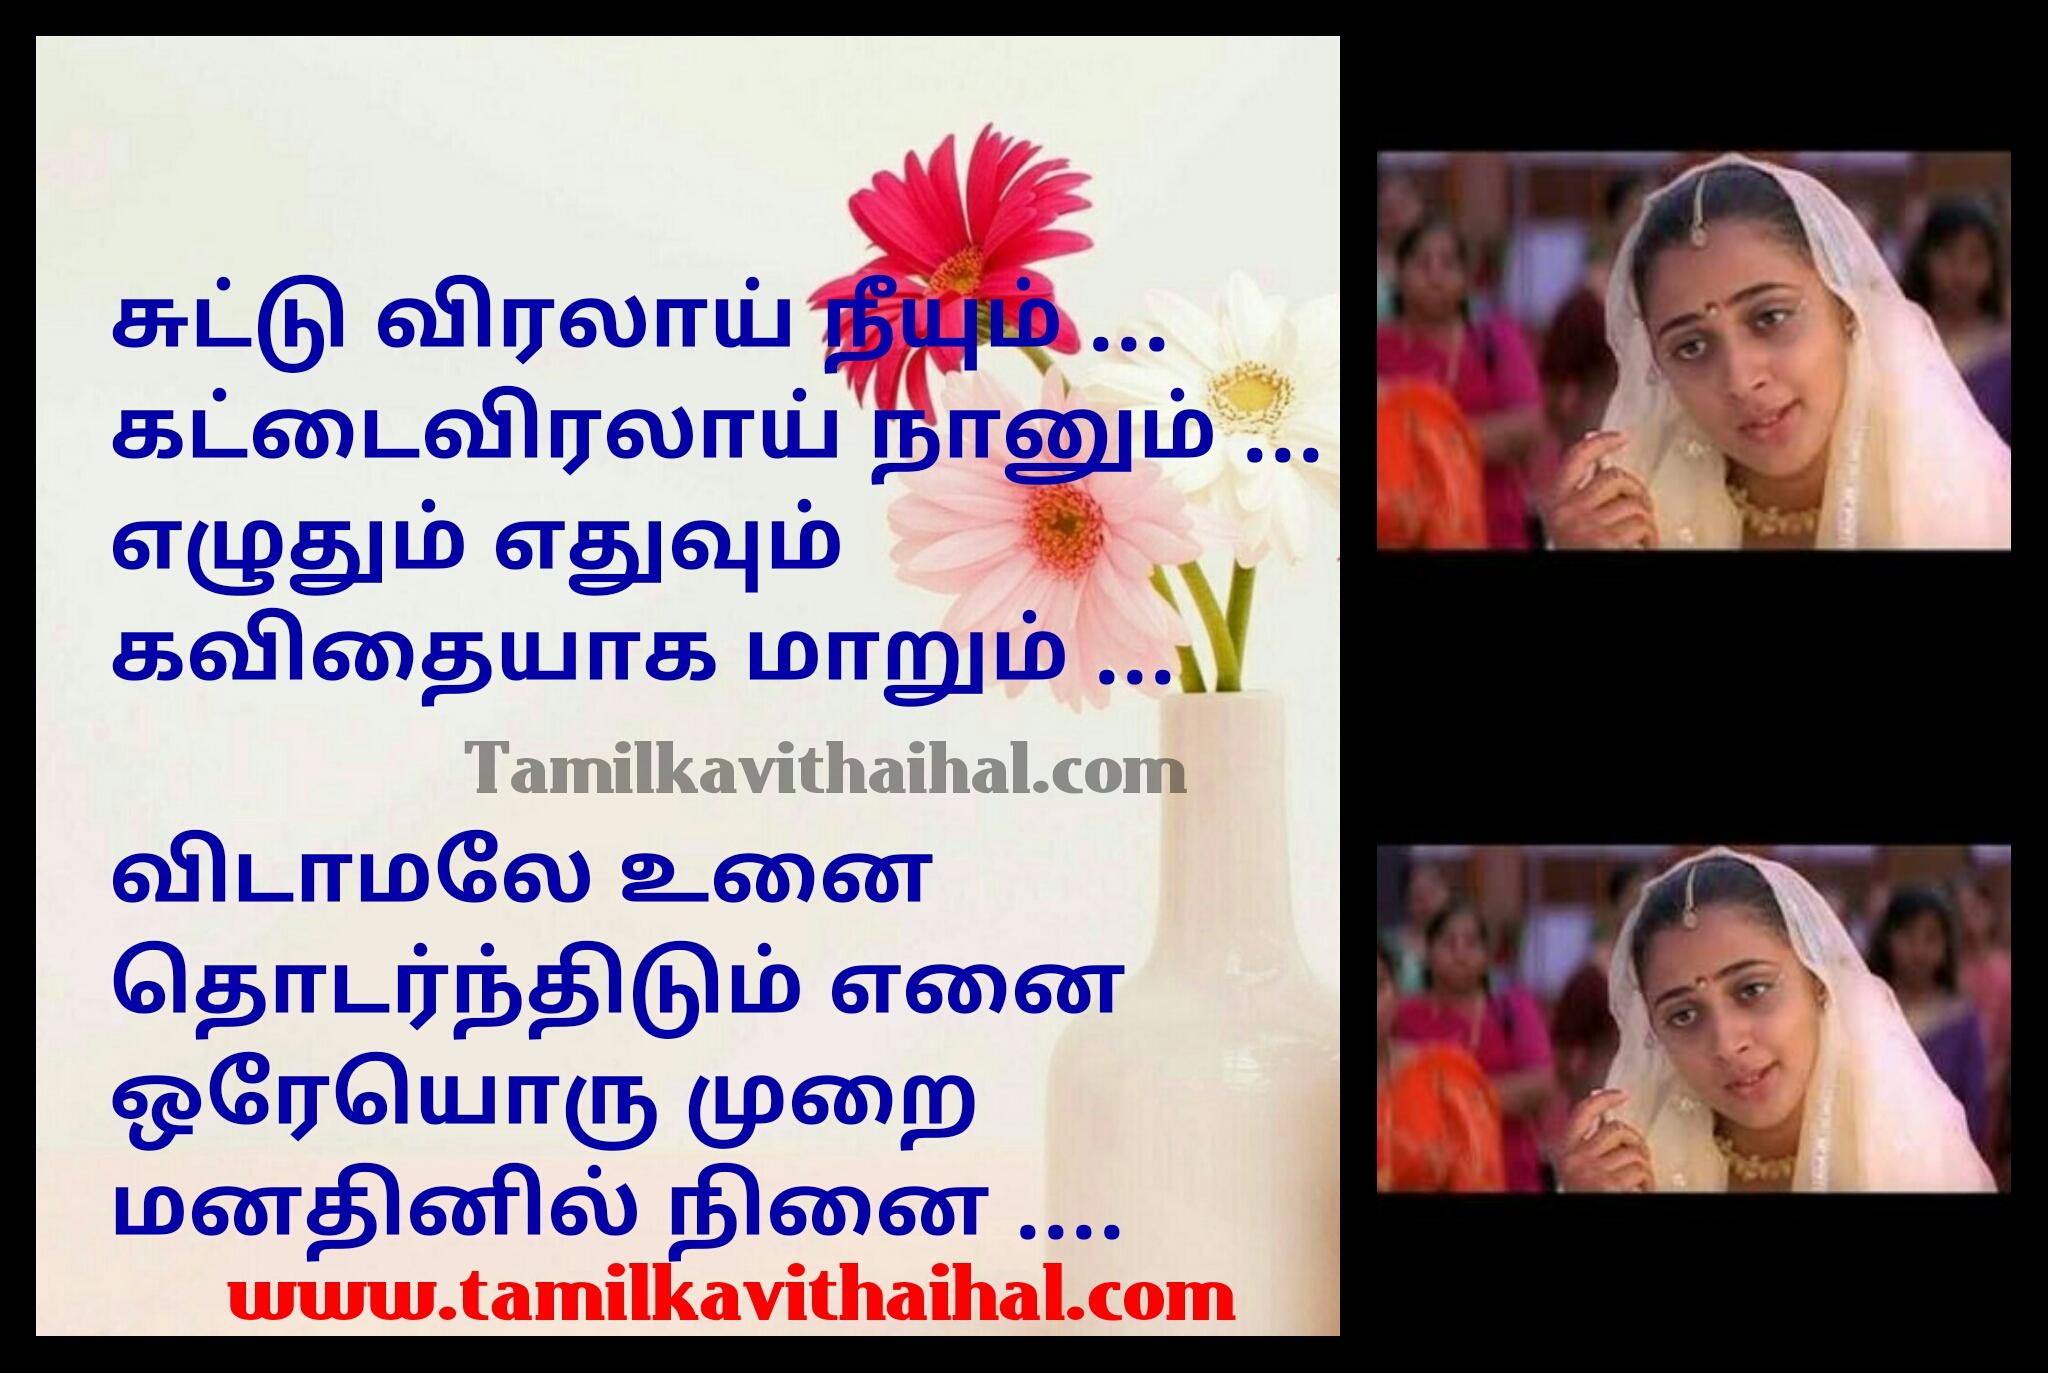 Best love song tamil quotes lyrics five star kadhal padal varigal